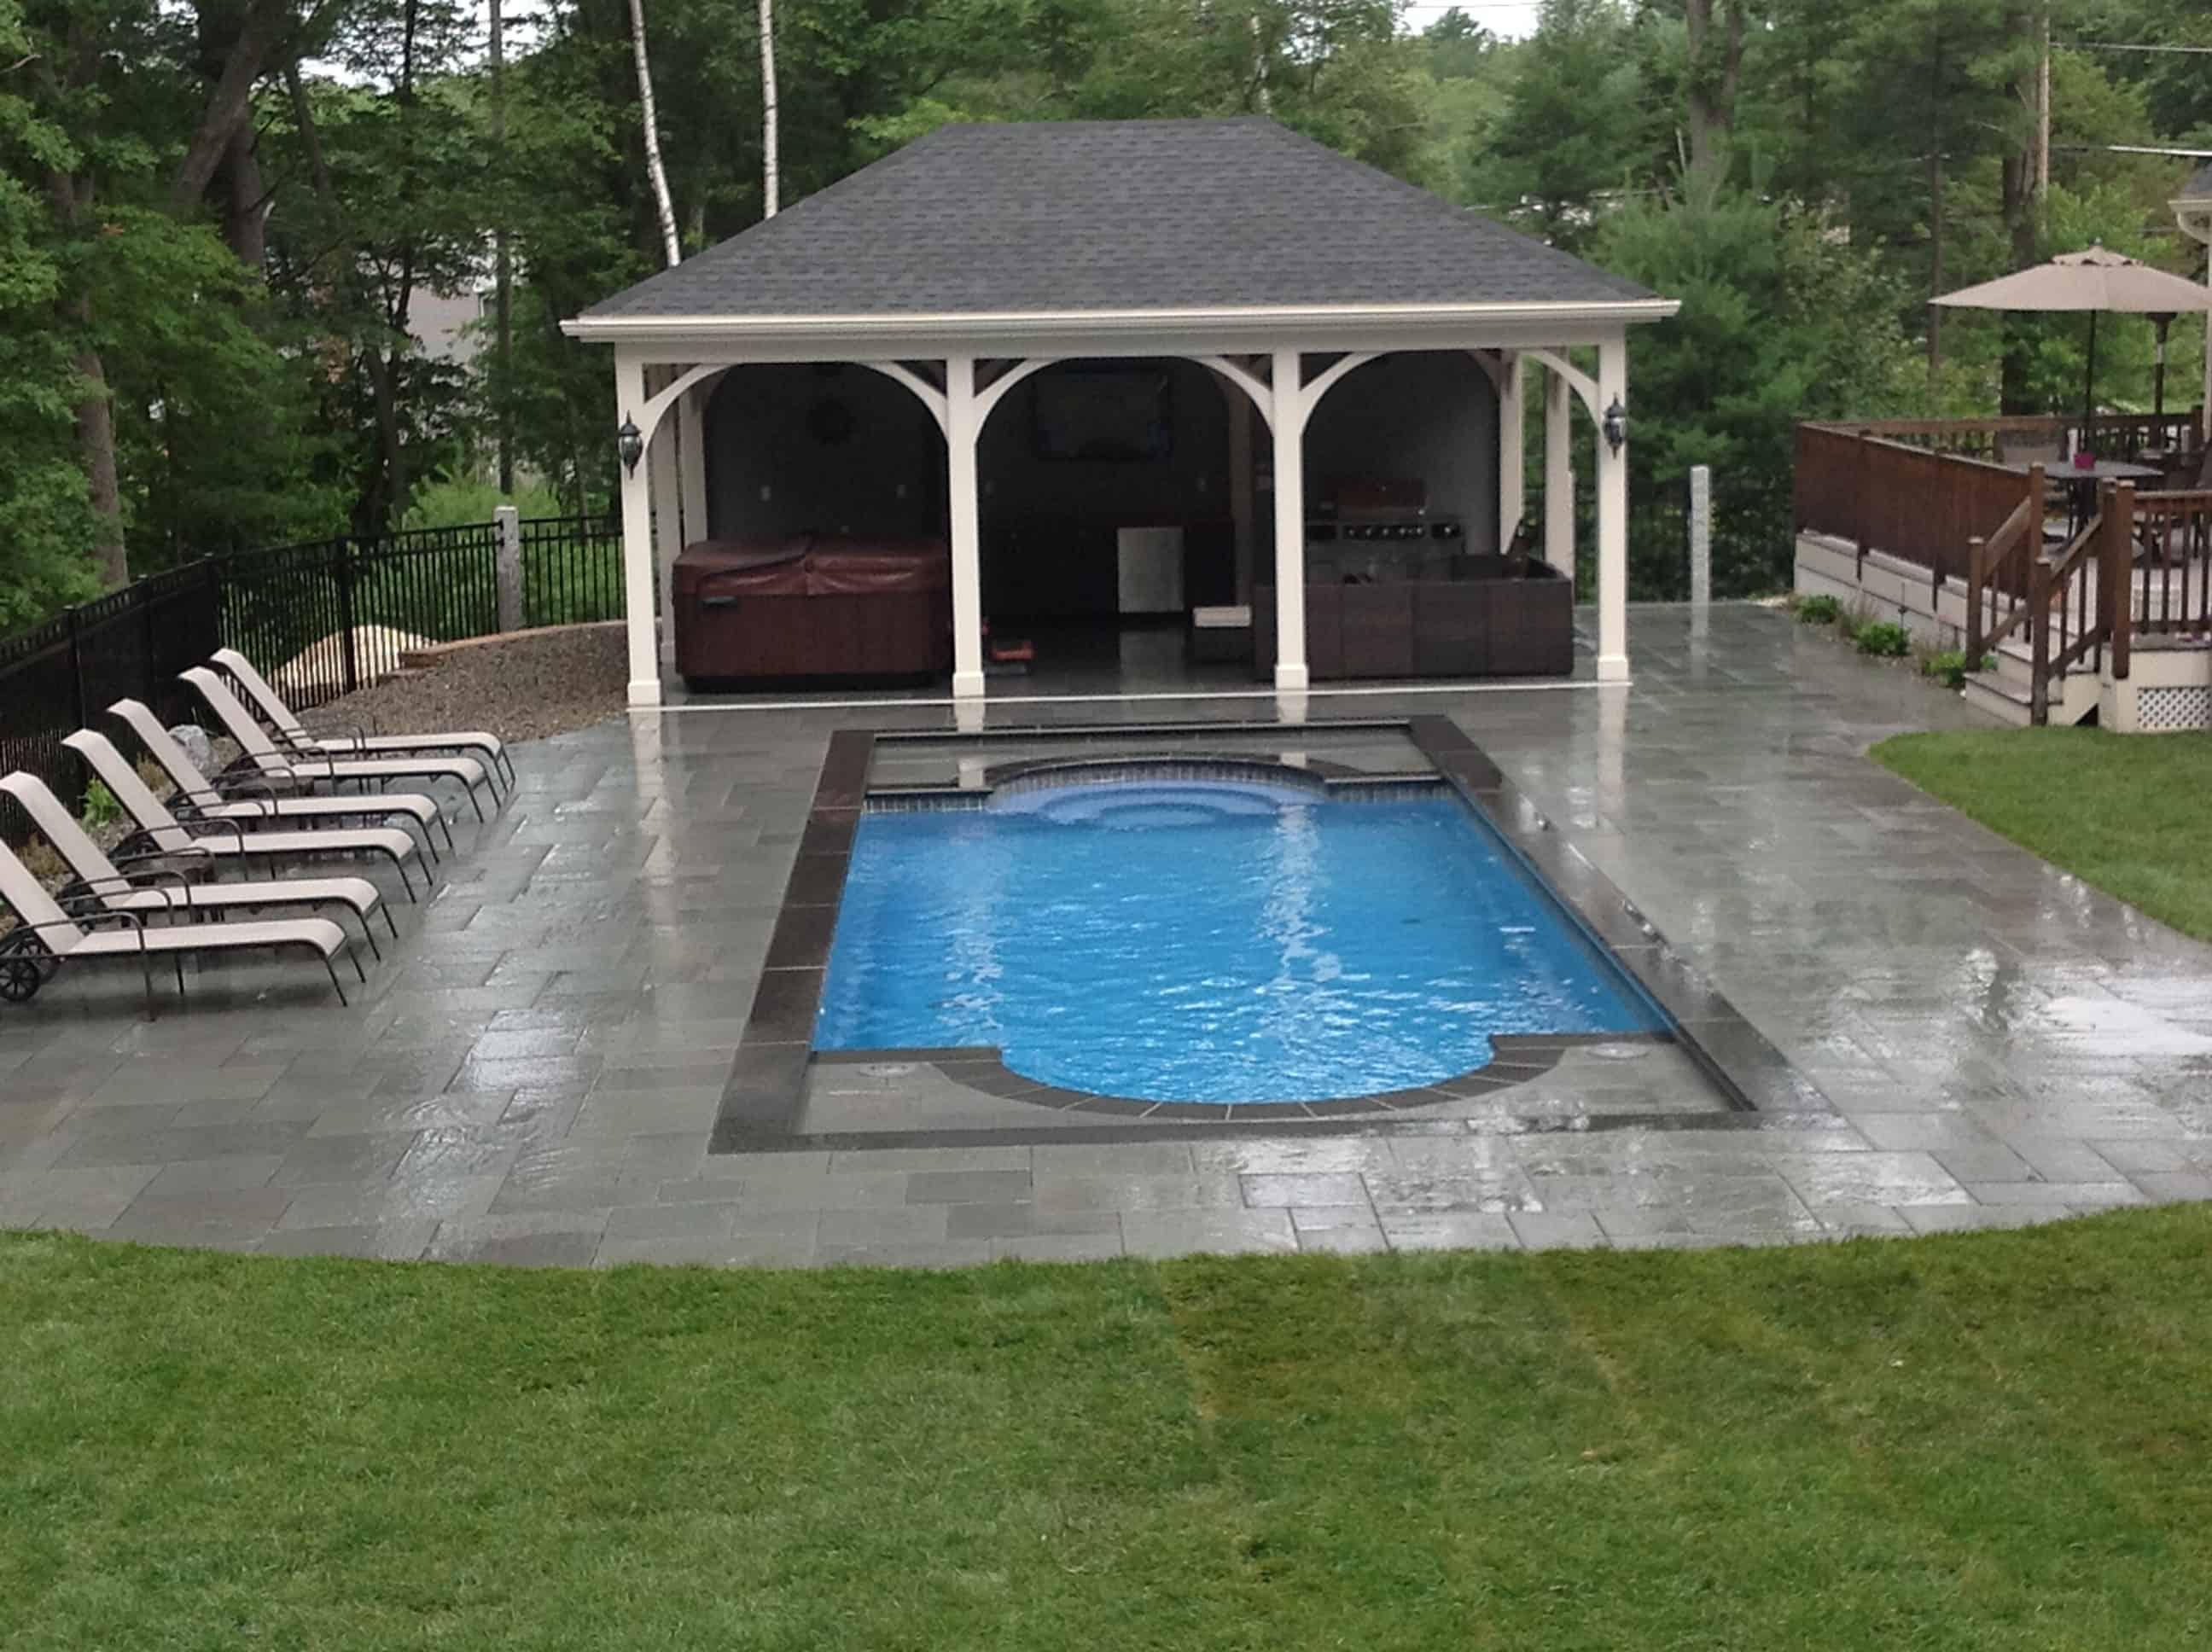 Hardscaped area around and Inground Pool